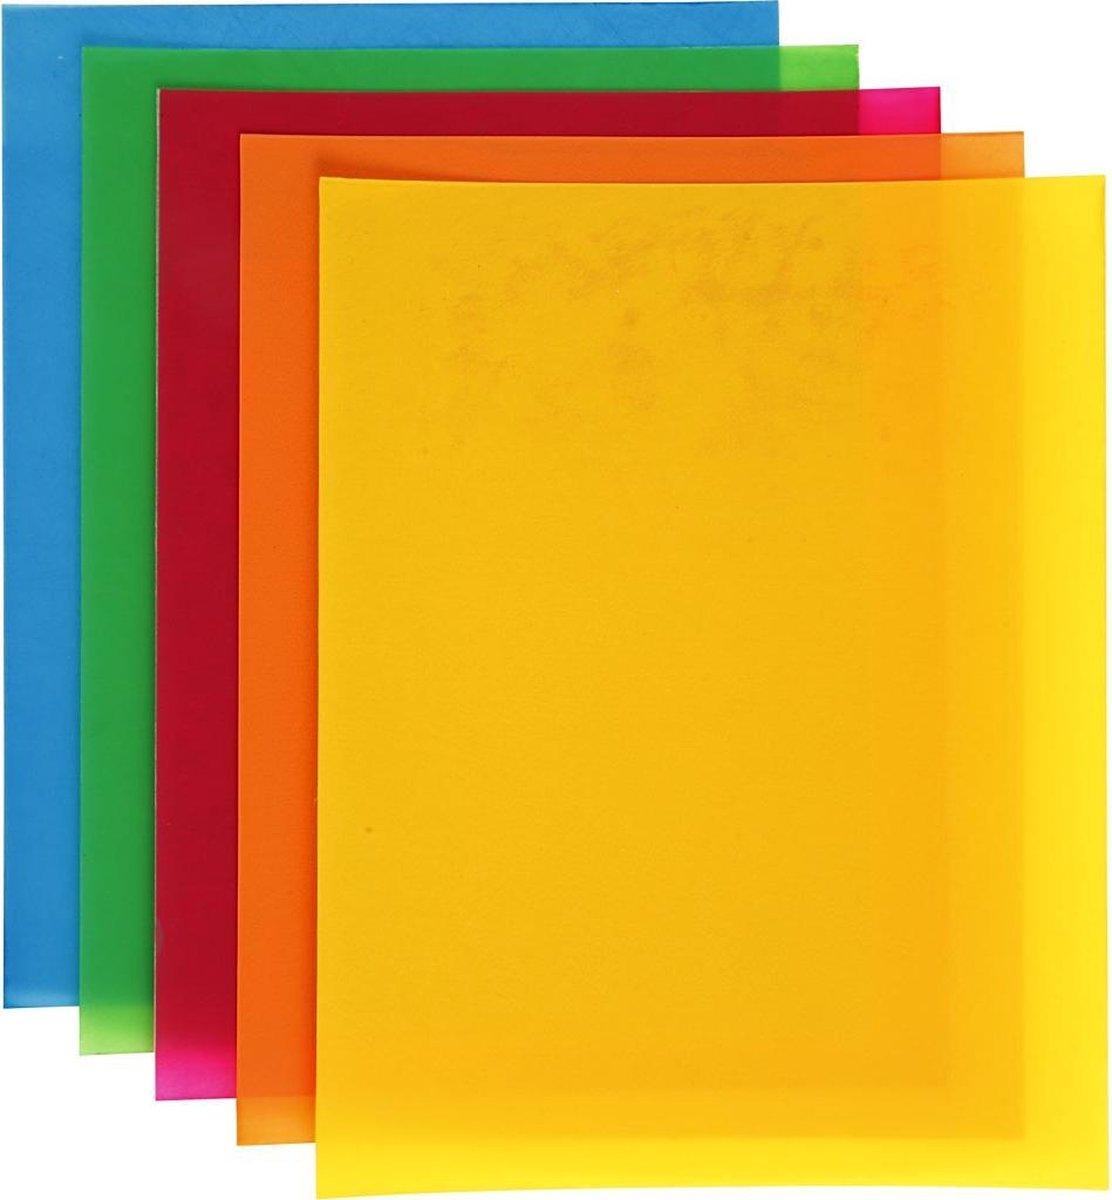 Krimpfolie vellen, vel 20x30 cm, sterke kleuren, 10 assorti vel - Creotime